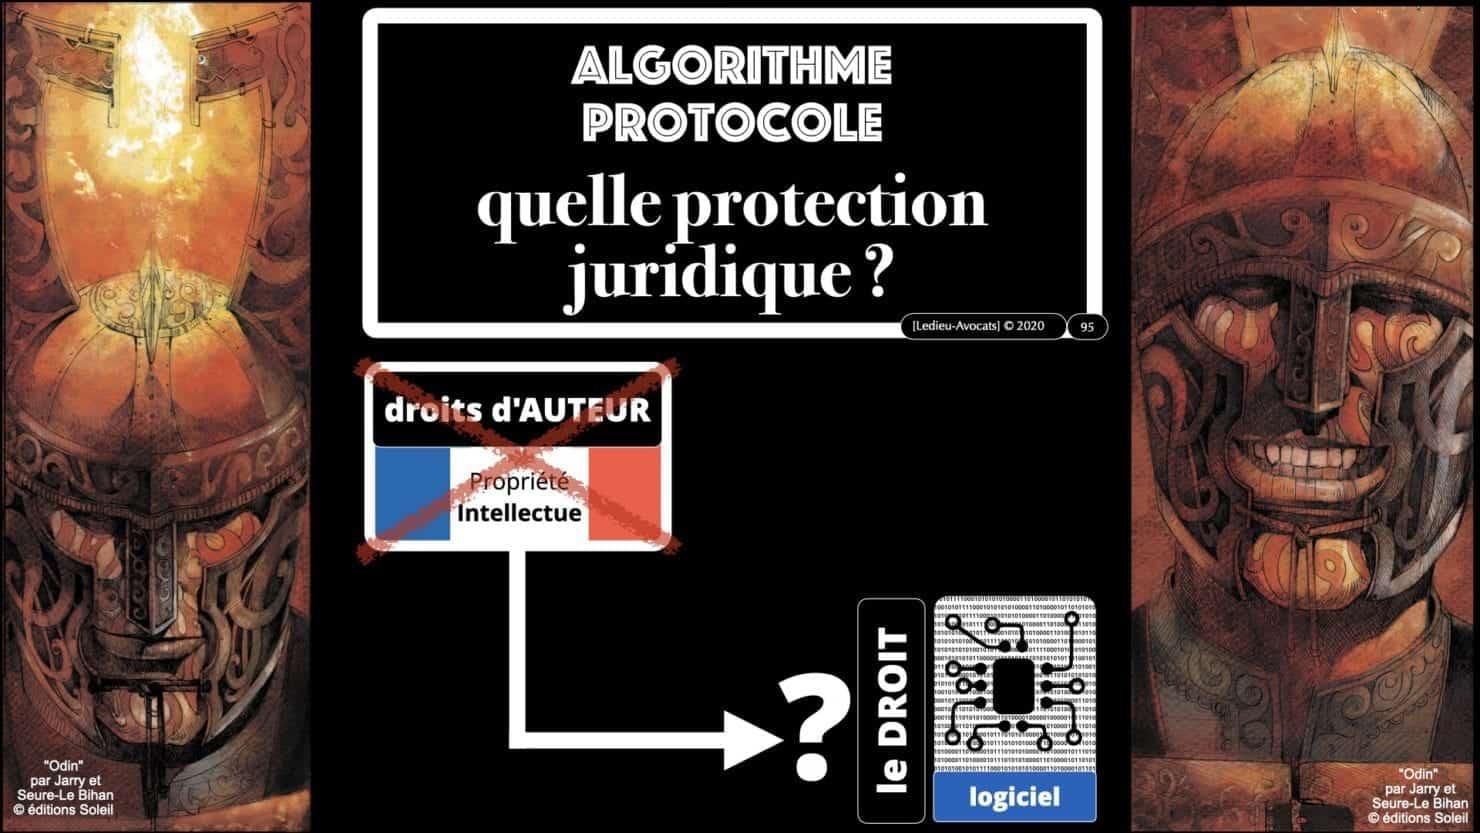 307 Intelligence artificielle-machine-learning-deep-learning-base de données-BIG-DATA *16:9* Constellation ©Ledieu-Avocat-13-10-2020.095